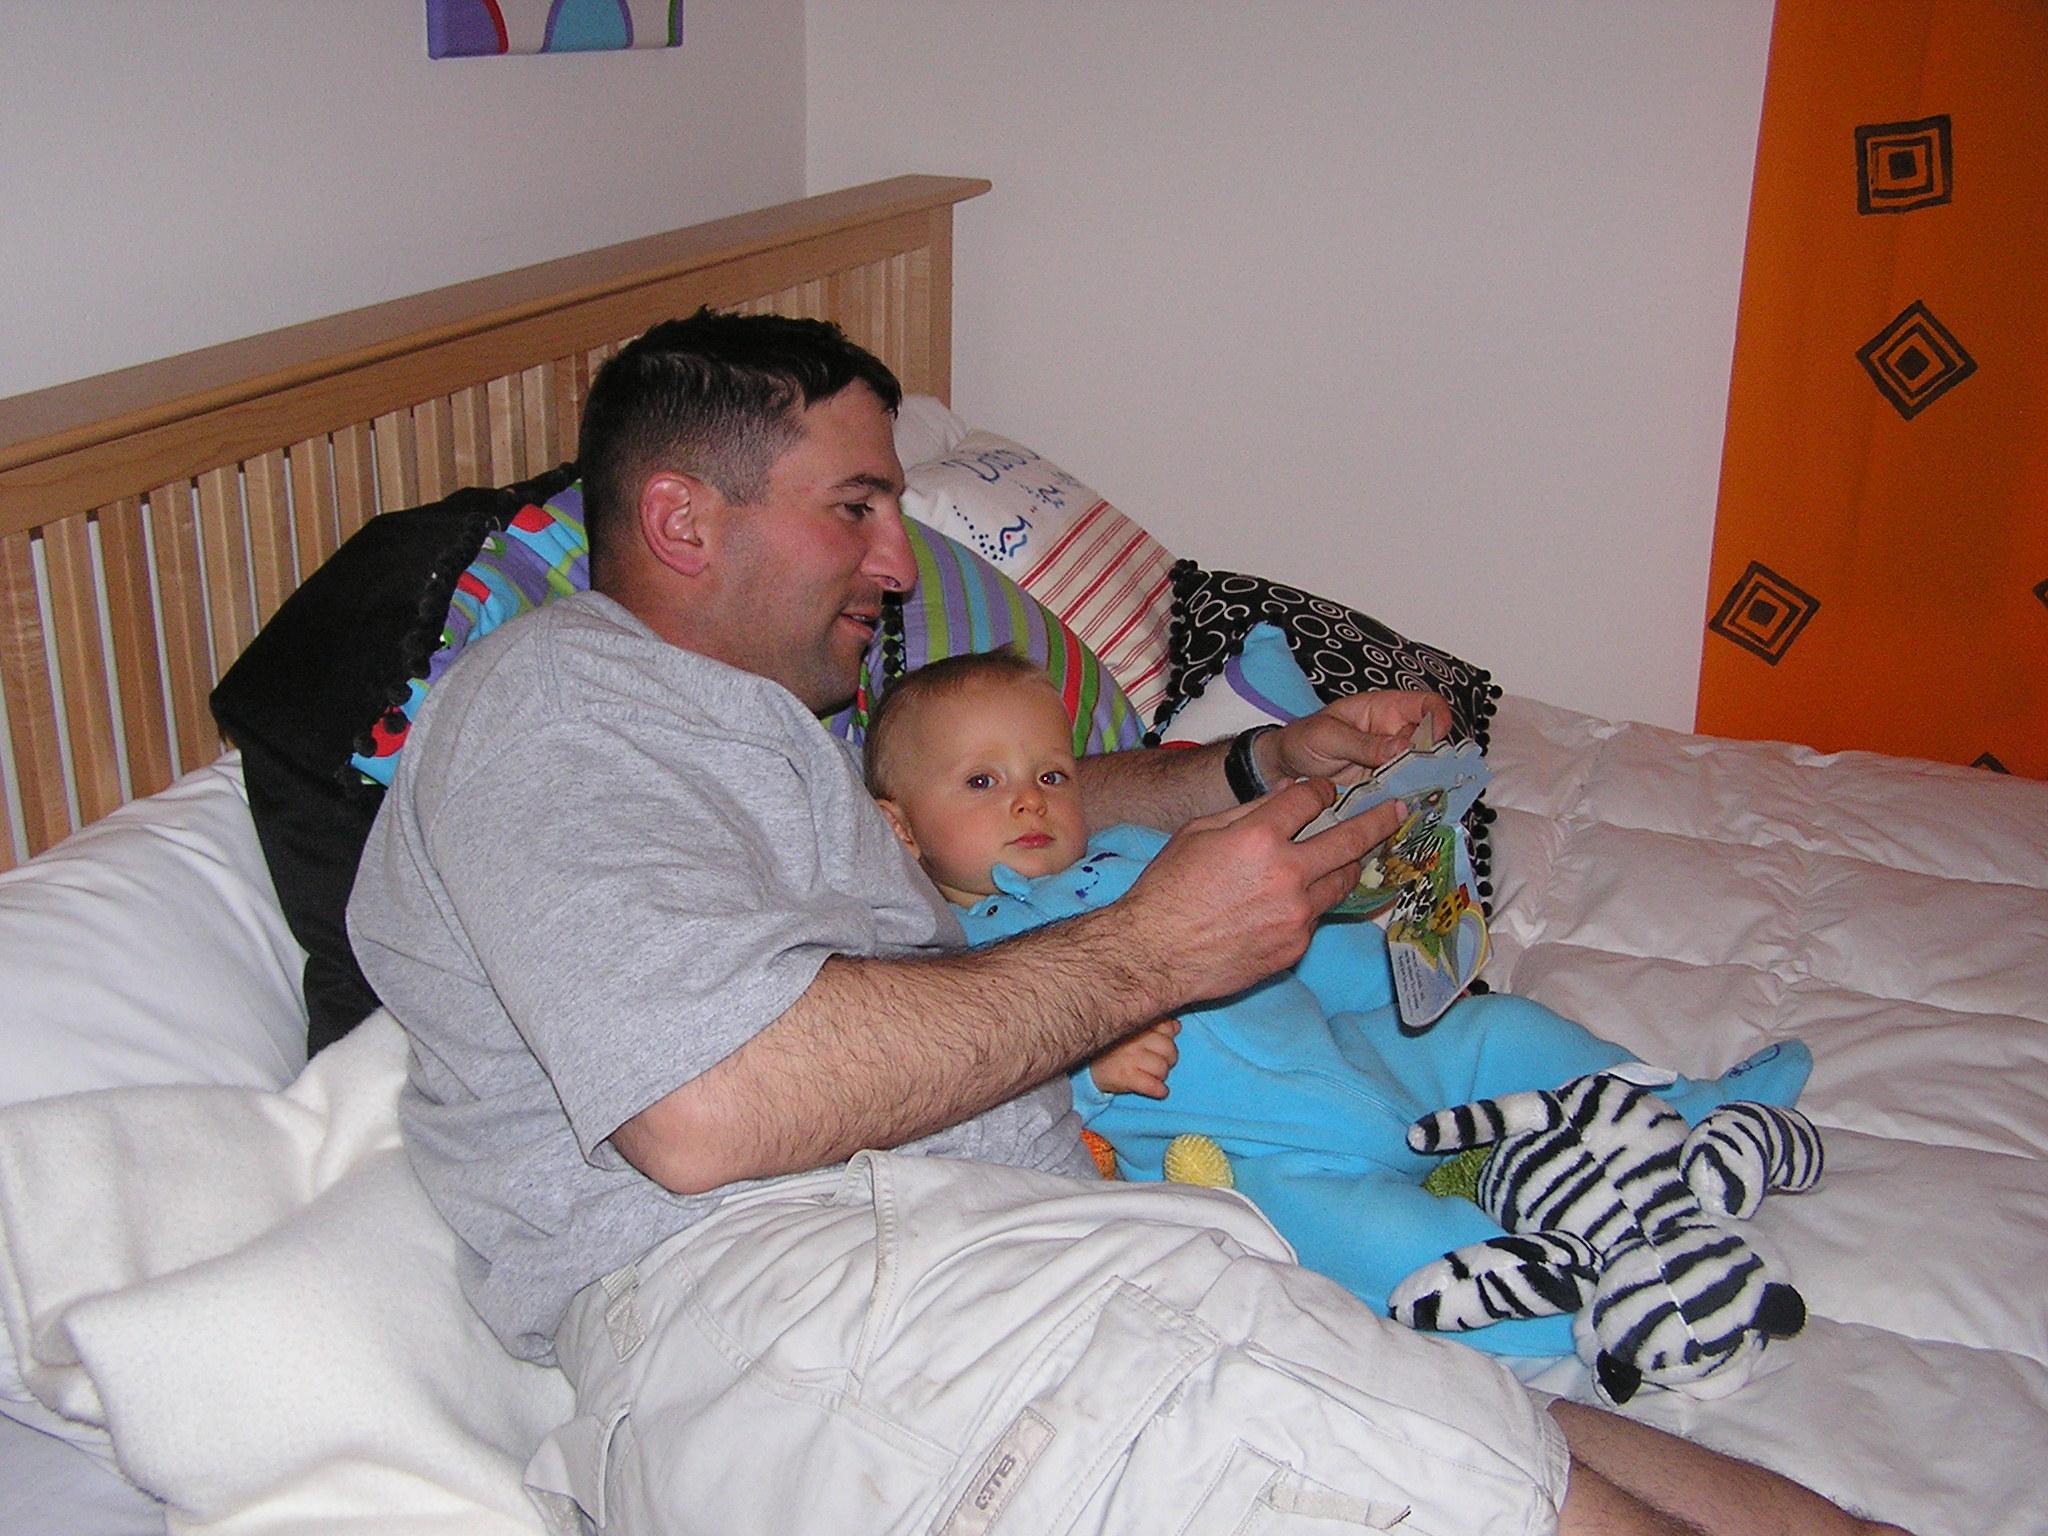 Meet Doug As He Reads To His Son